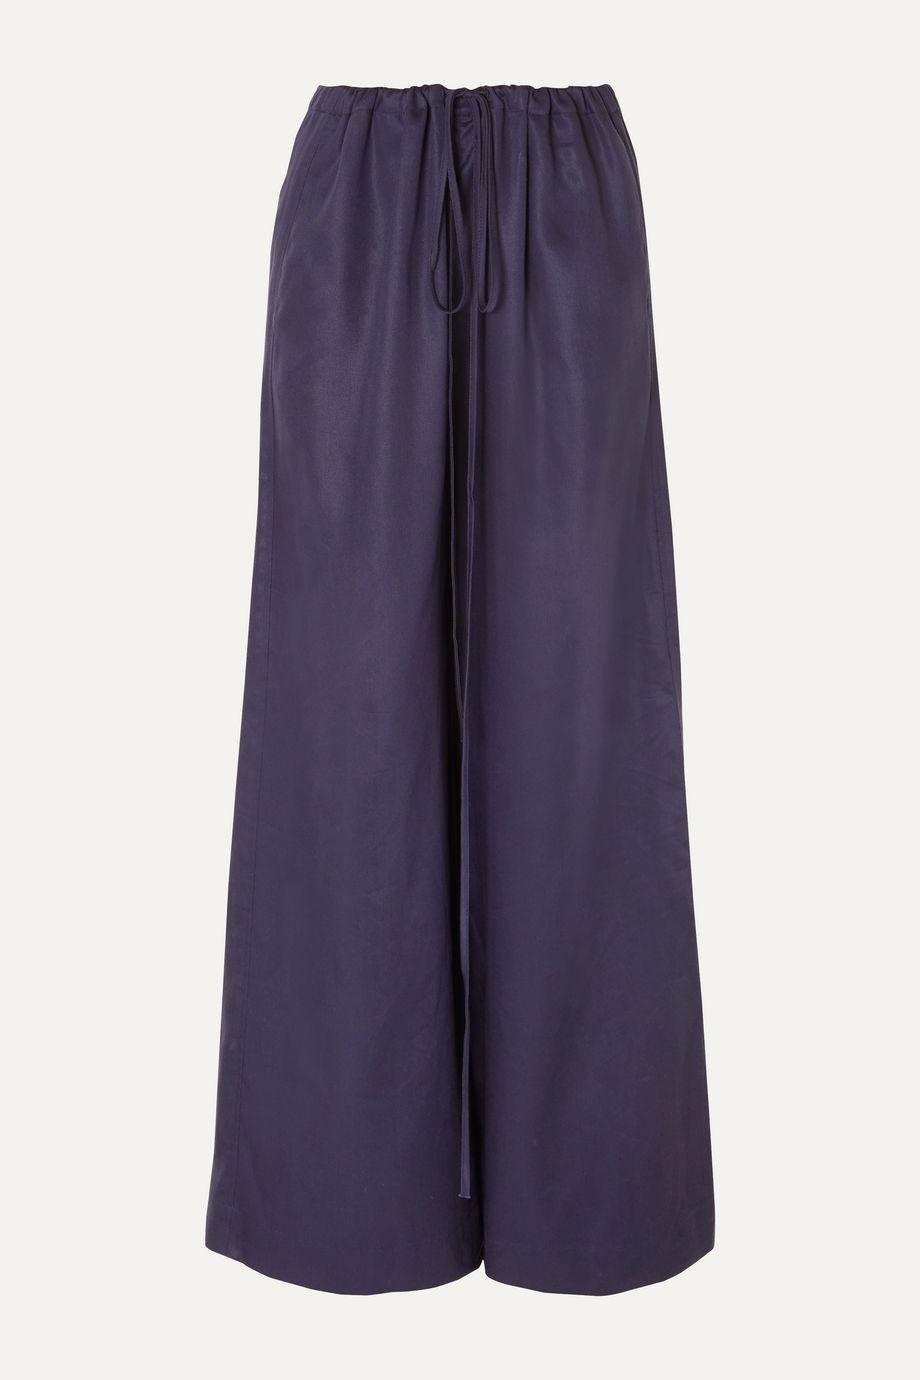 BONDI BORN Lyocell wide-leg pants